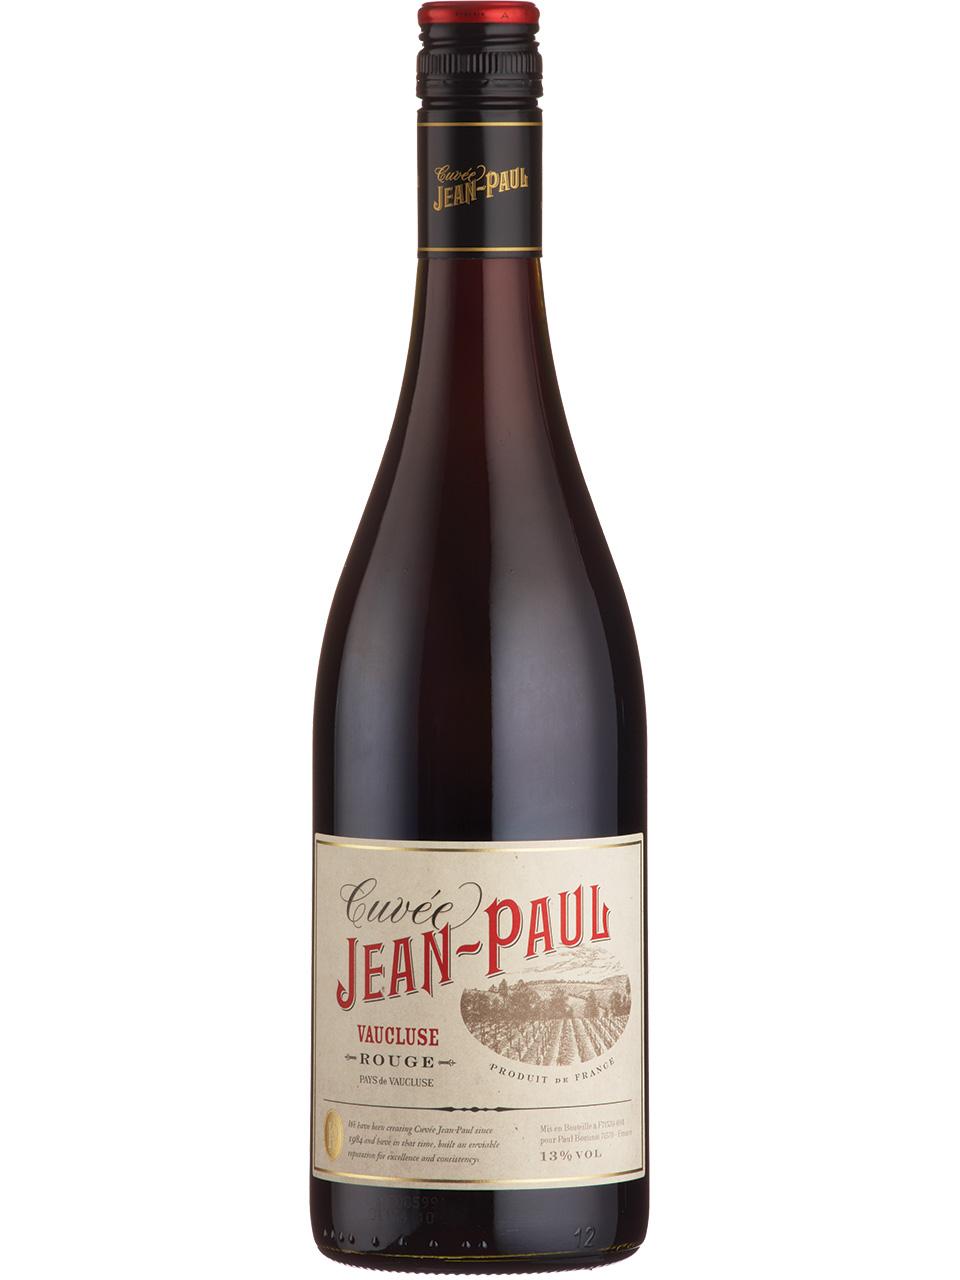 Cuvee Jean Paul Vaucluse Rouge